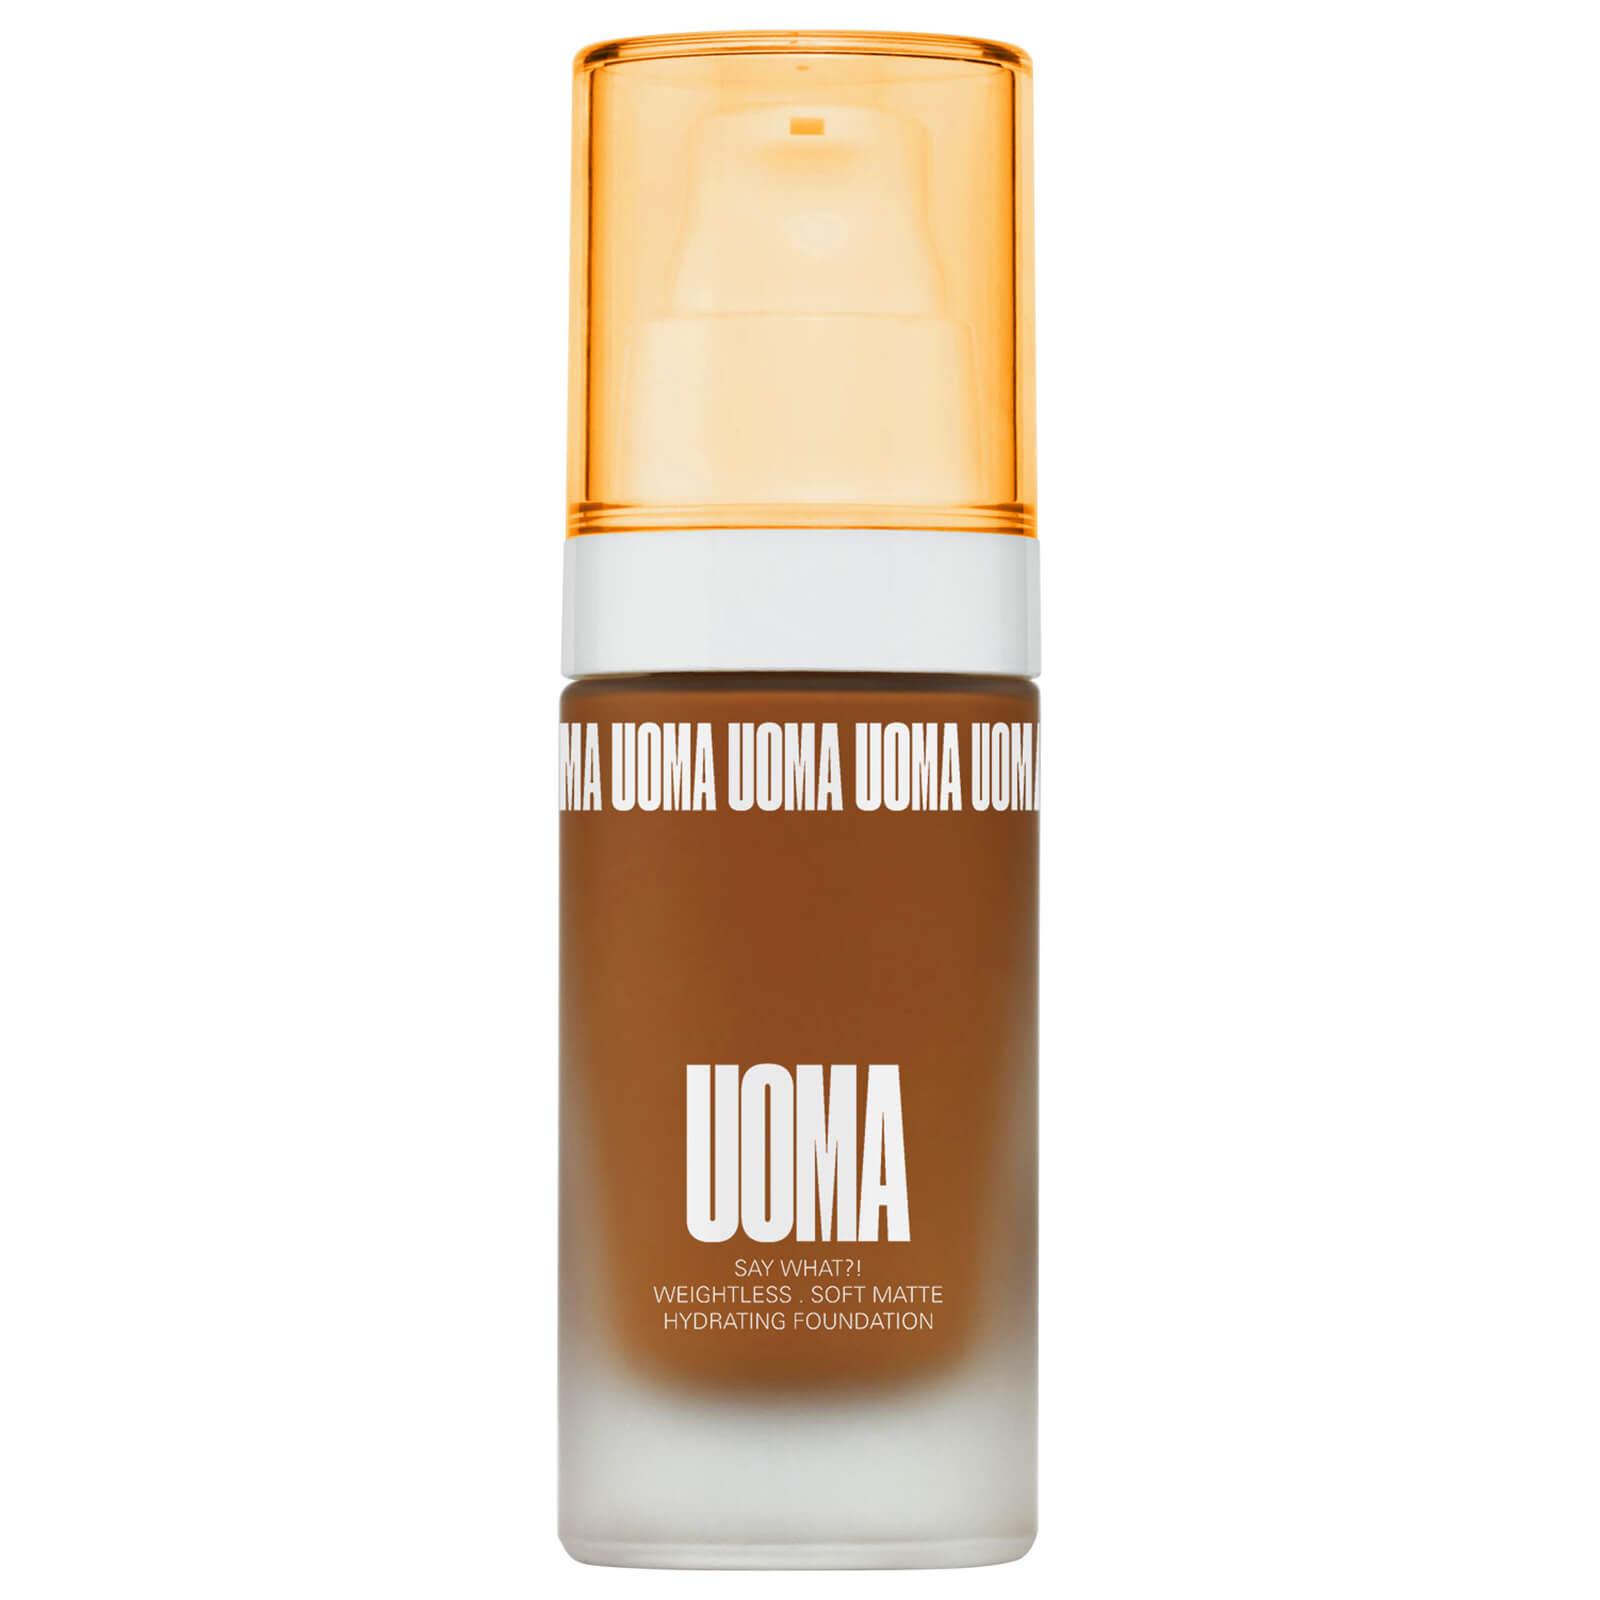 Купить UOMA Beauty Say What Foundation 30ml (Various Shades) - Brown Sugar T2C